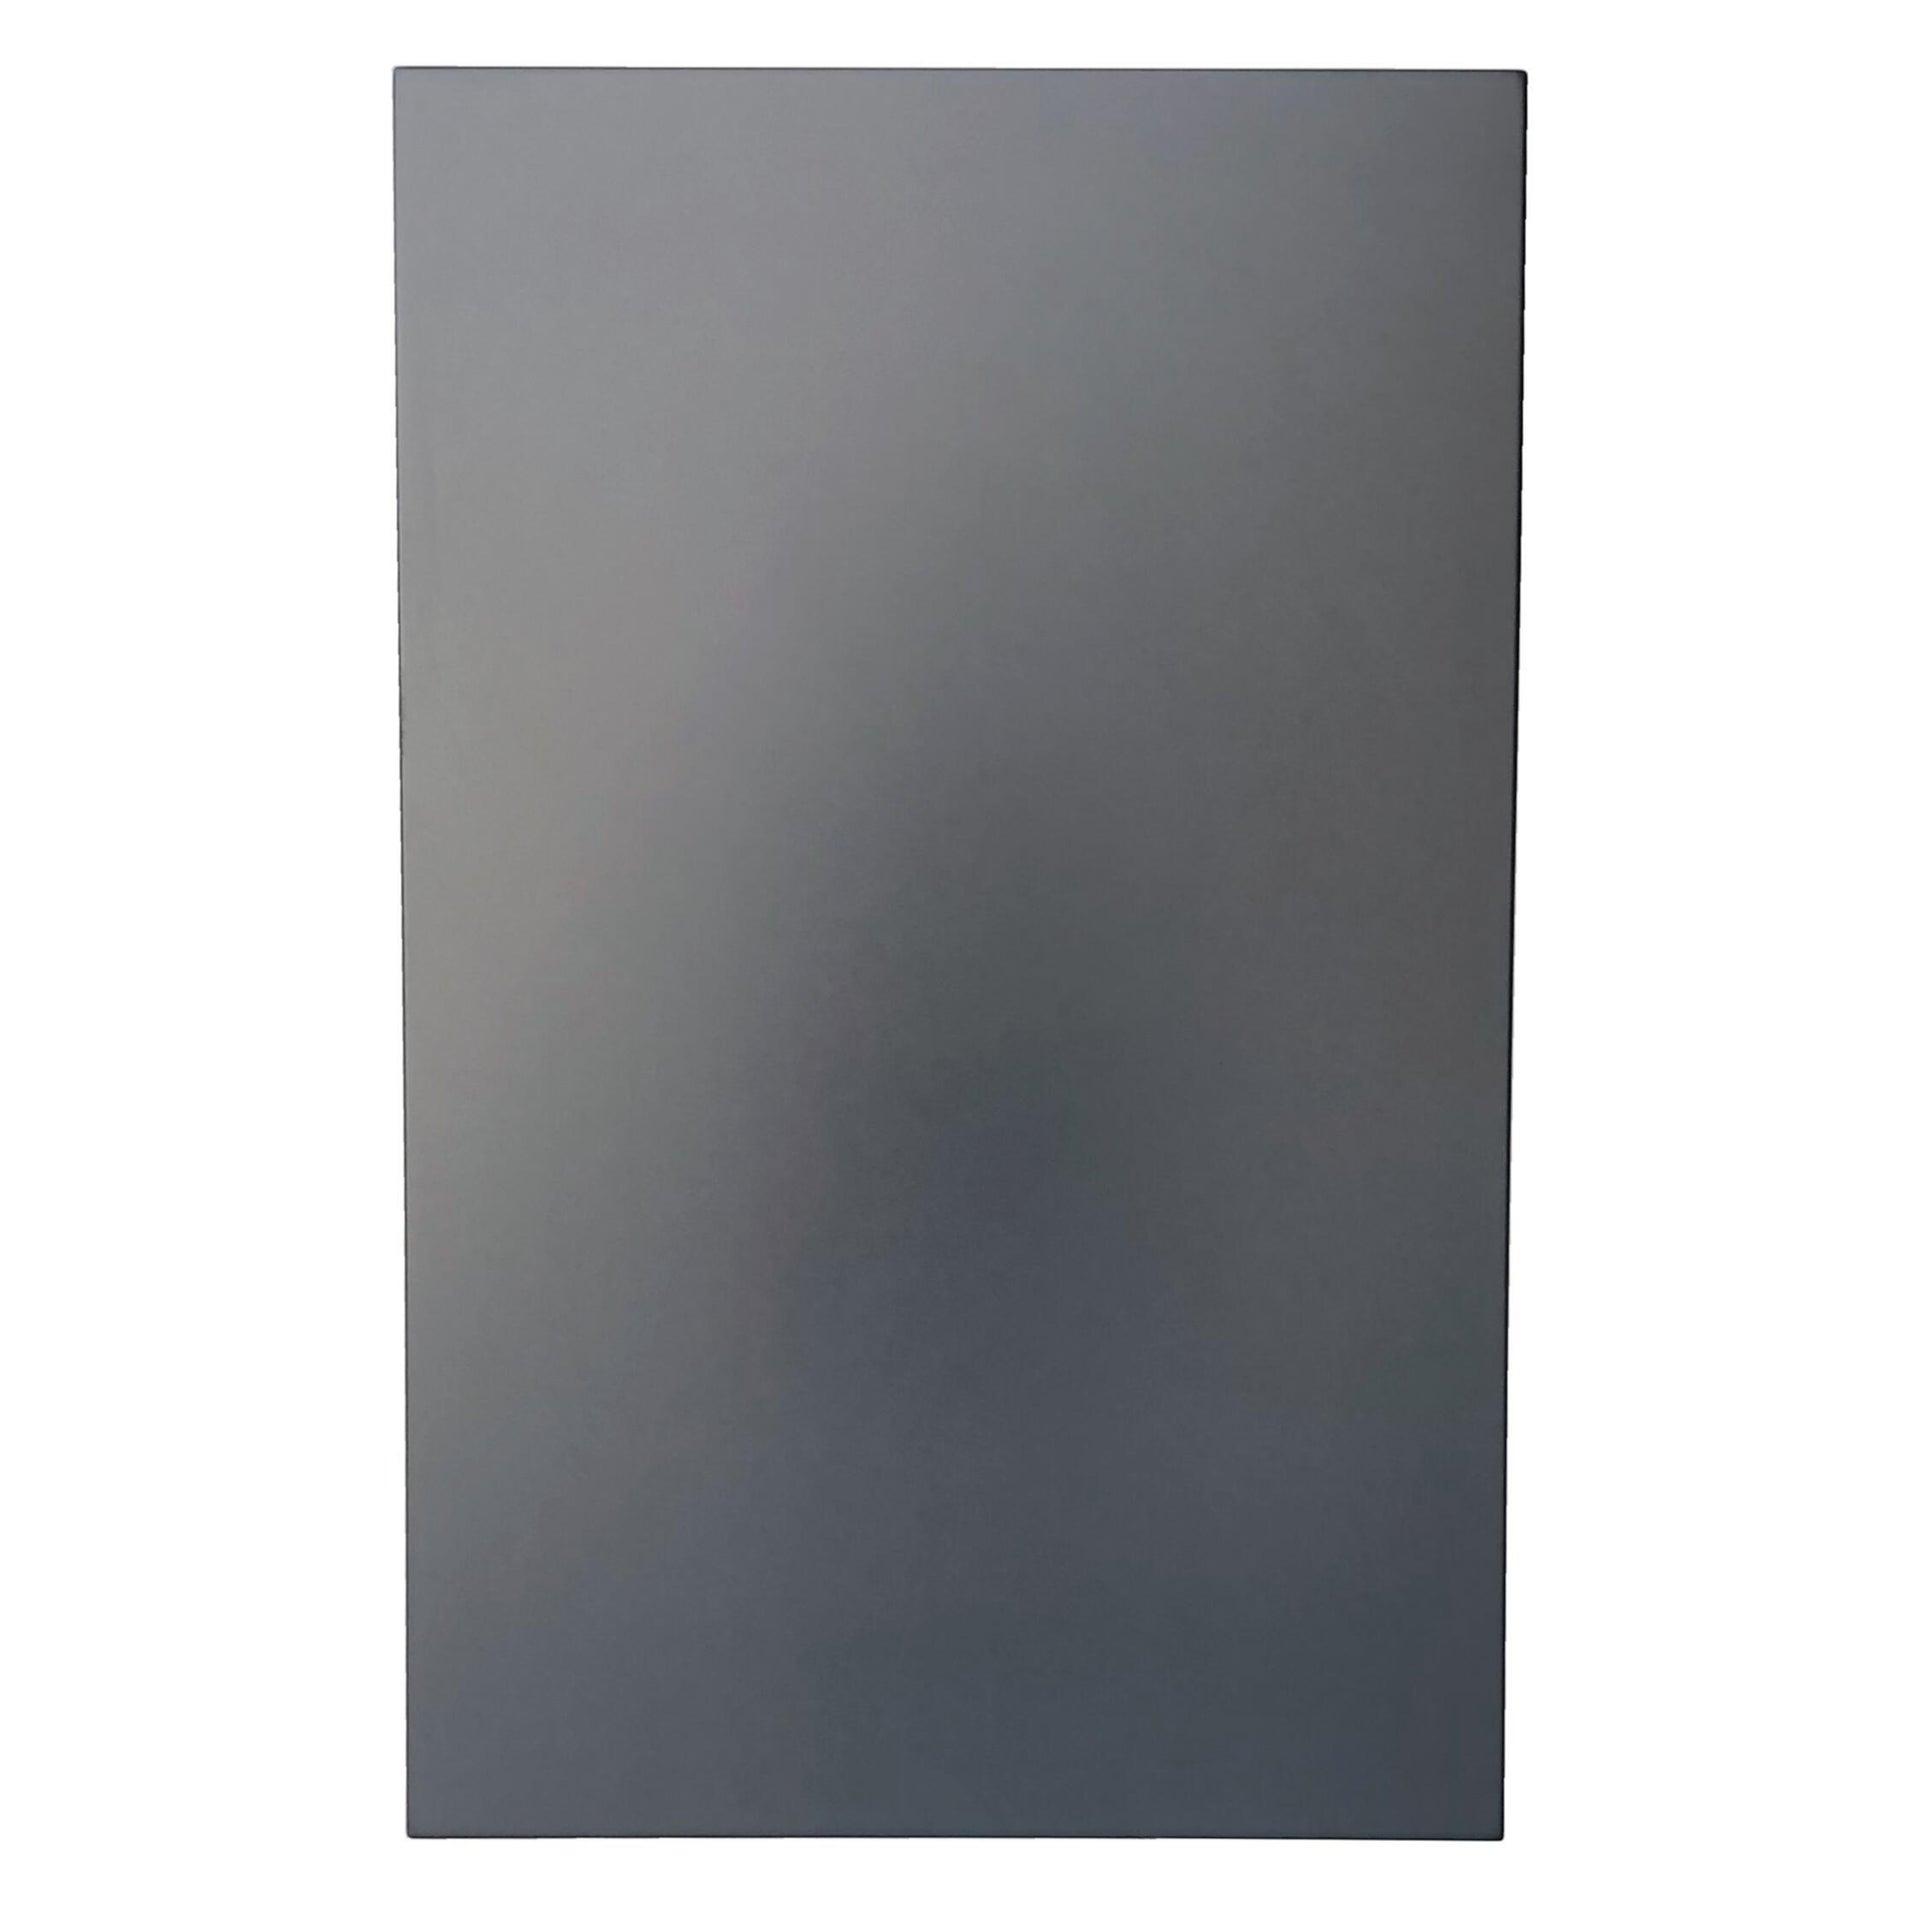 Anta DELINIA ID Parigi 76.5 x 44.7 blu